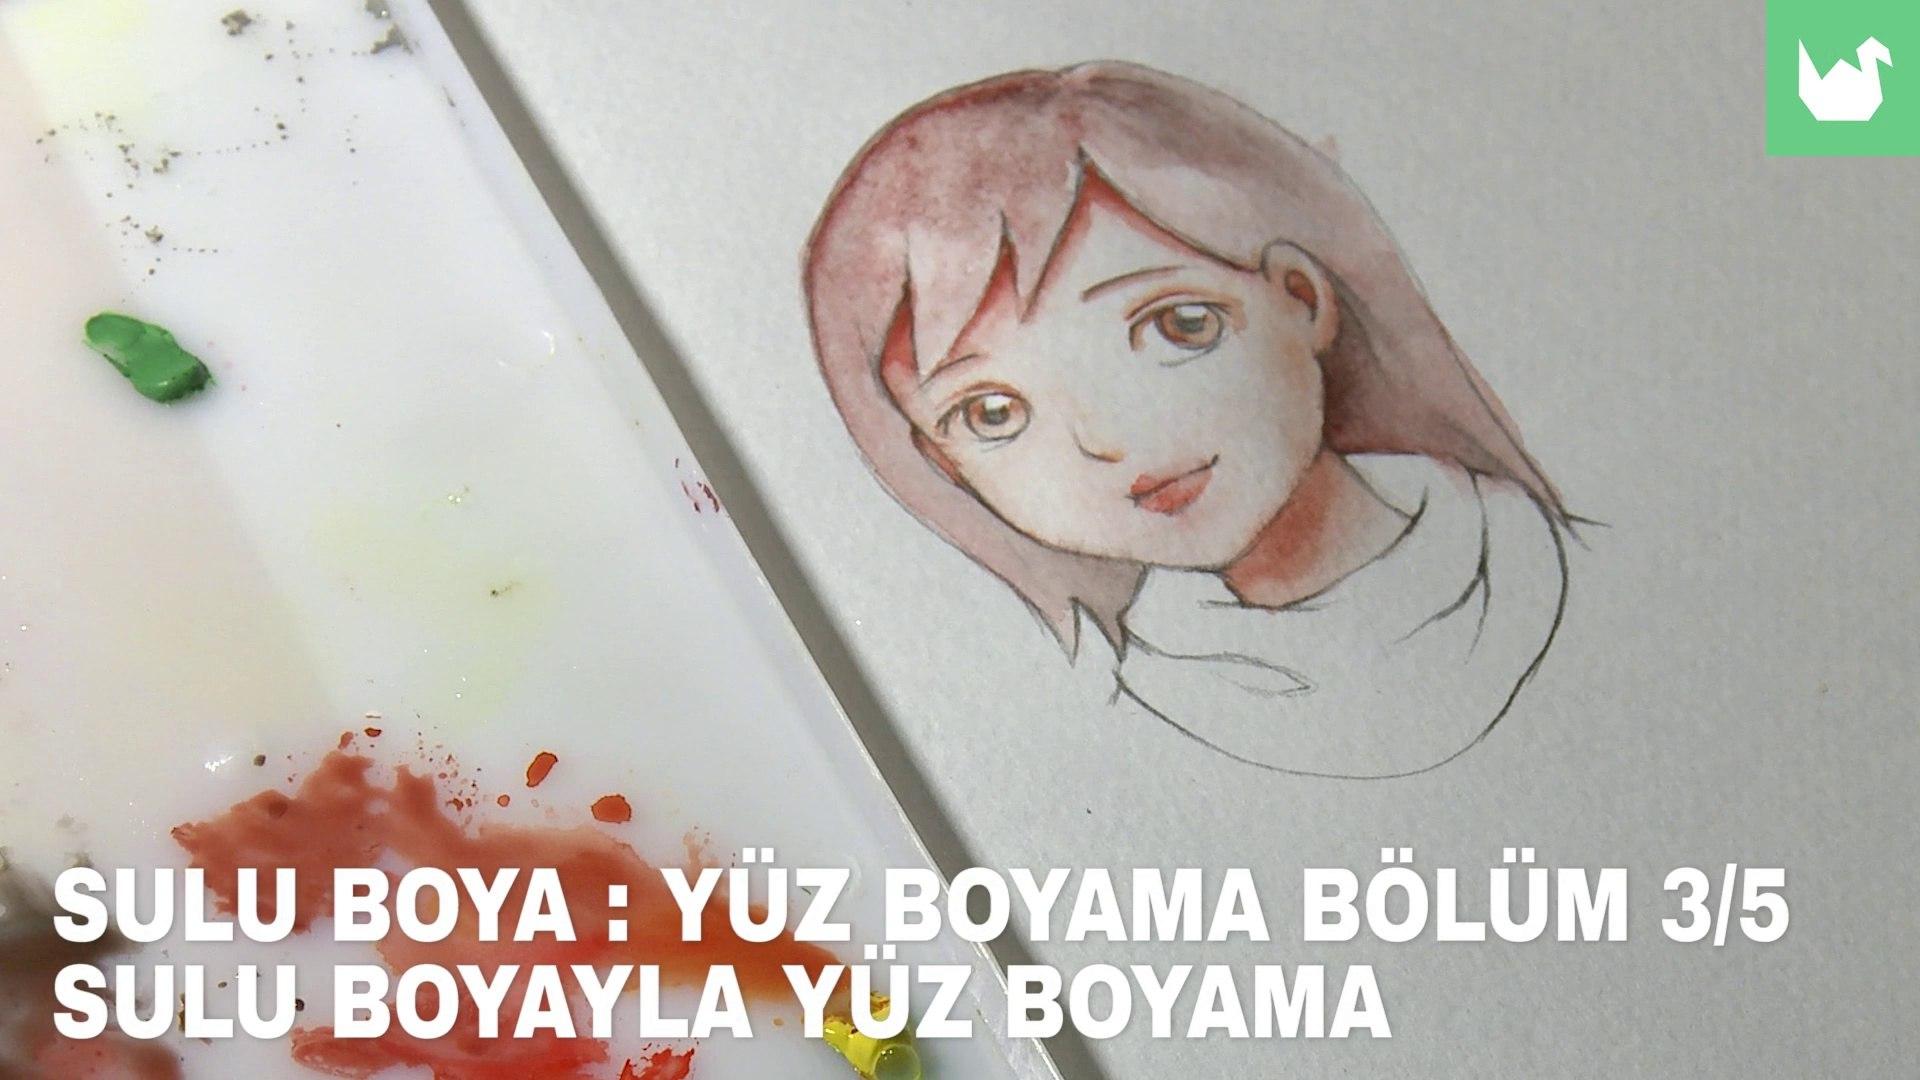 Sulu Boya Yuz Boyama 3 5 Boyama Video Dailymotion